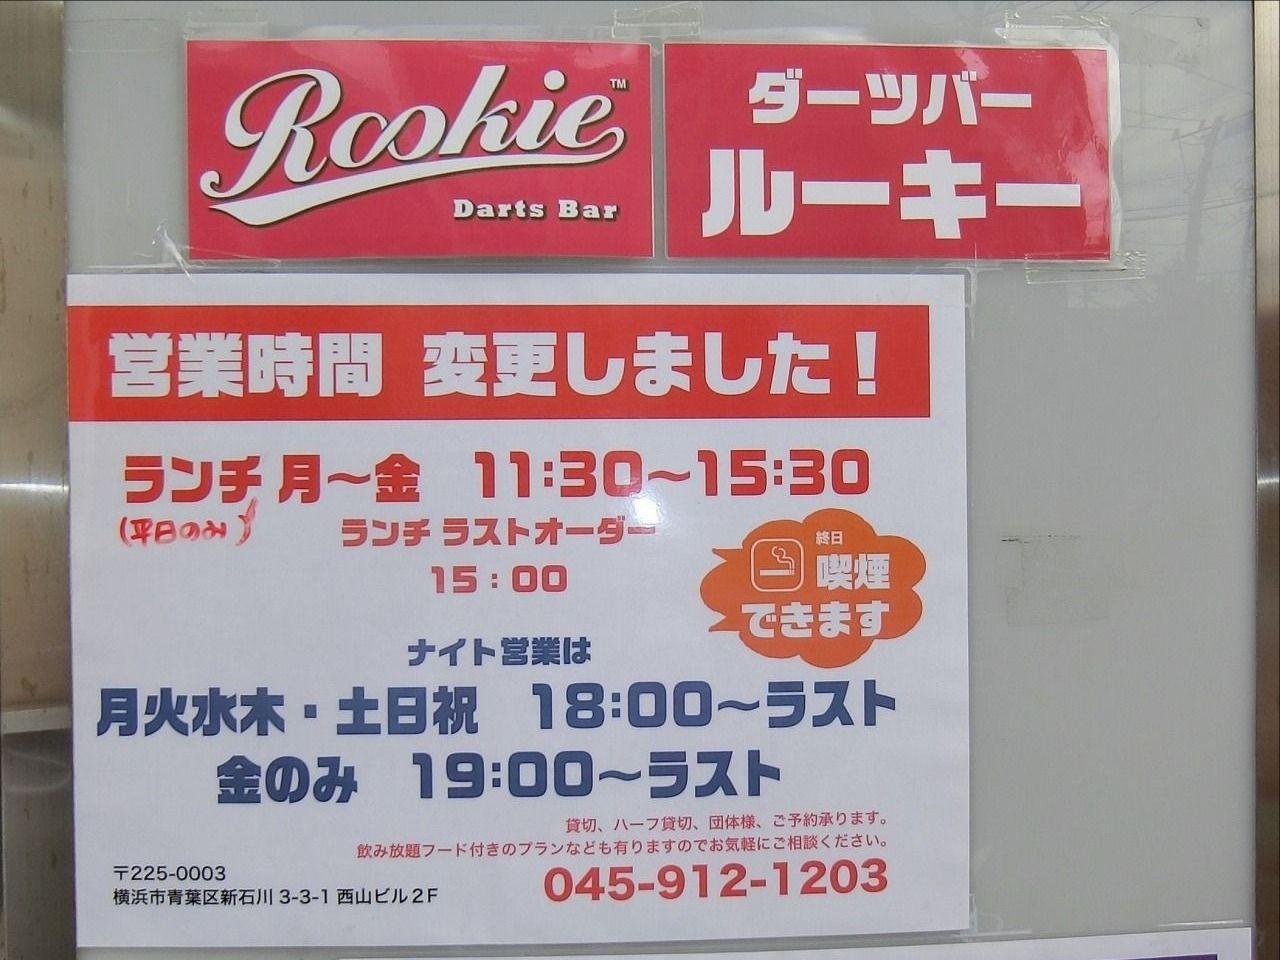 Rookie ダーツバー・ルーキー の営業時間変更のお知らせ